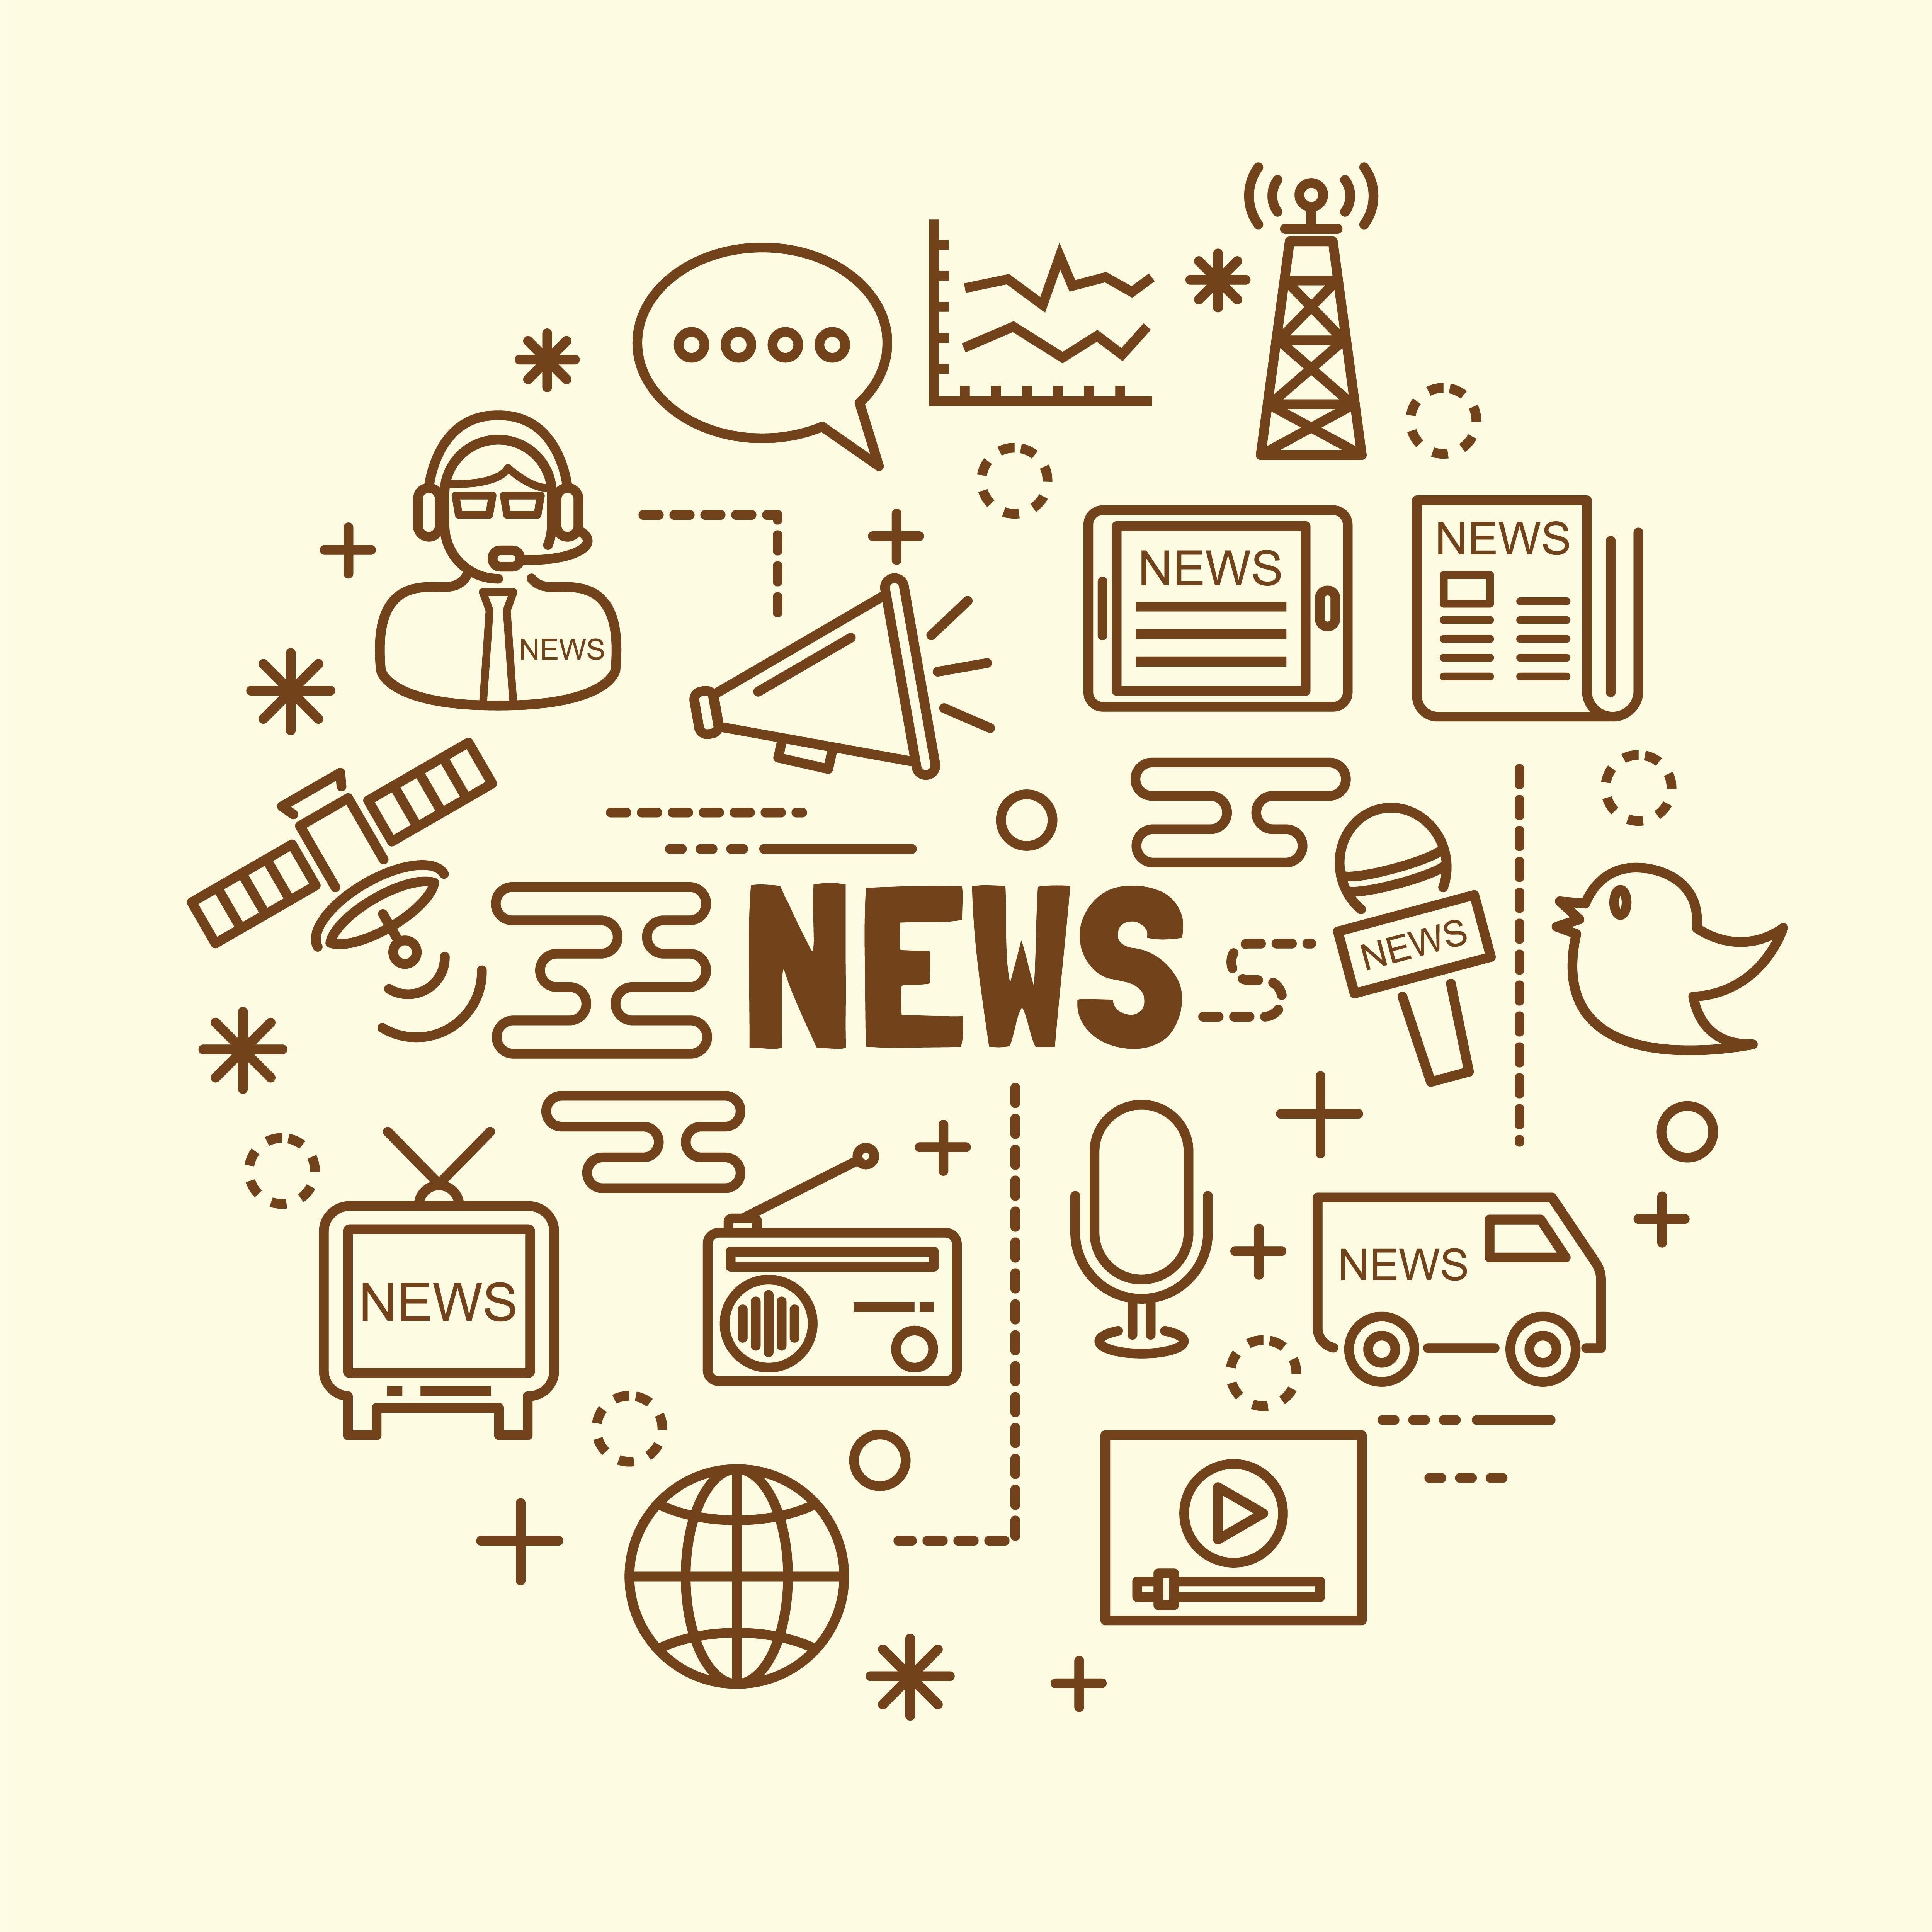 News ()